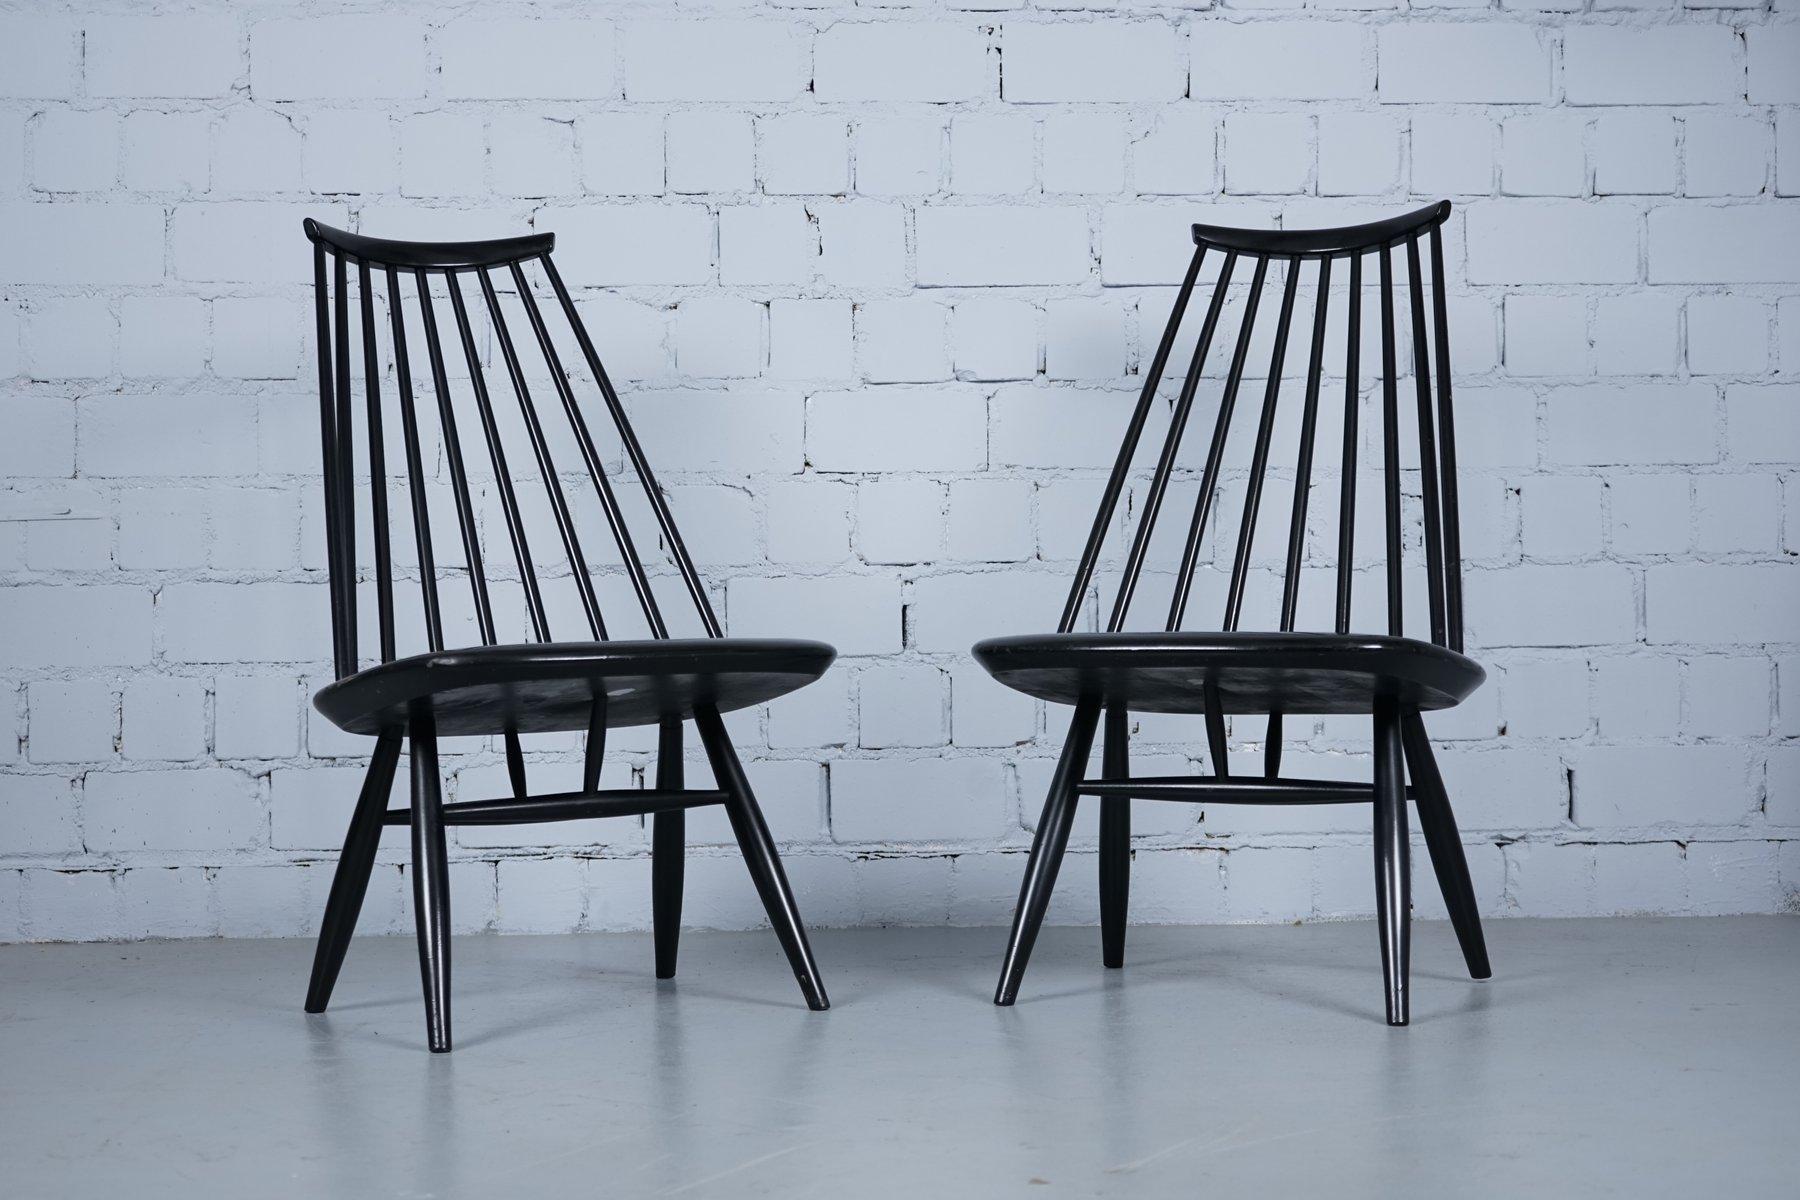 schwarze mademoiselle st hle von imari tapiovaara f r asko. Black Bedroom Furniture Sets. Home Design Ideas